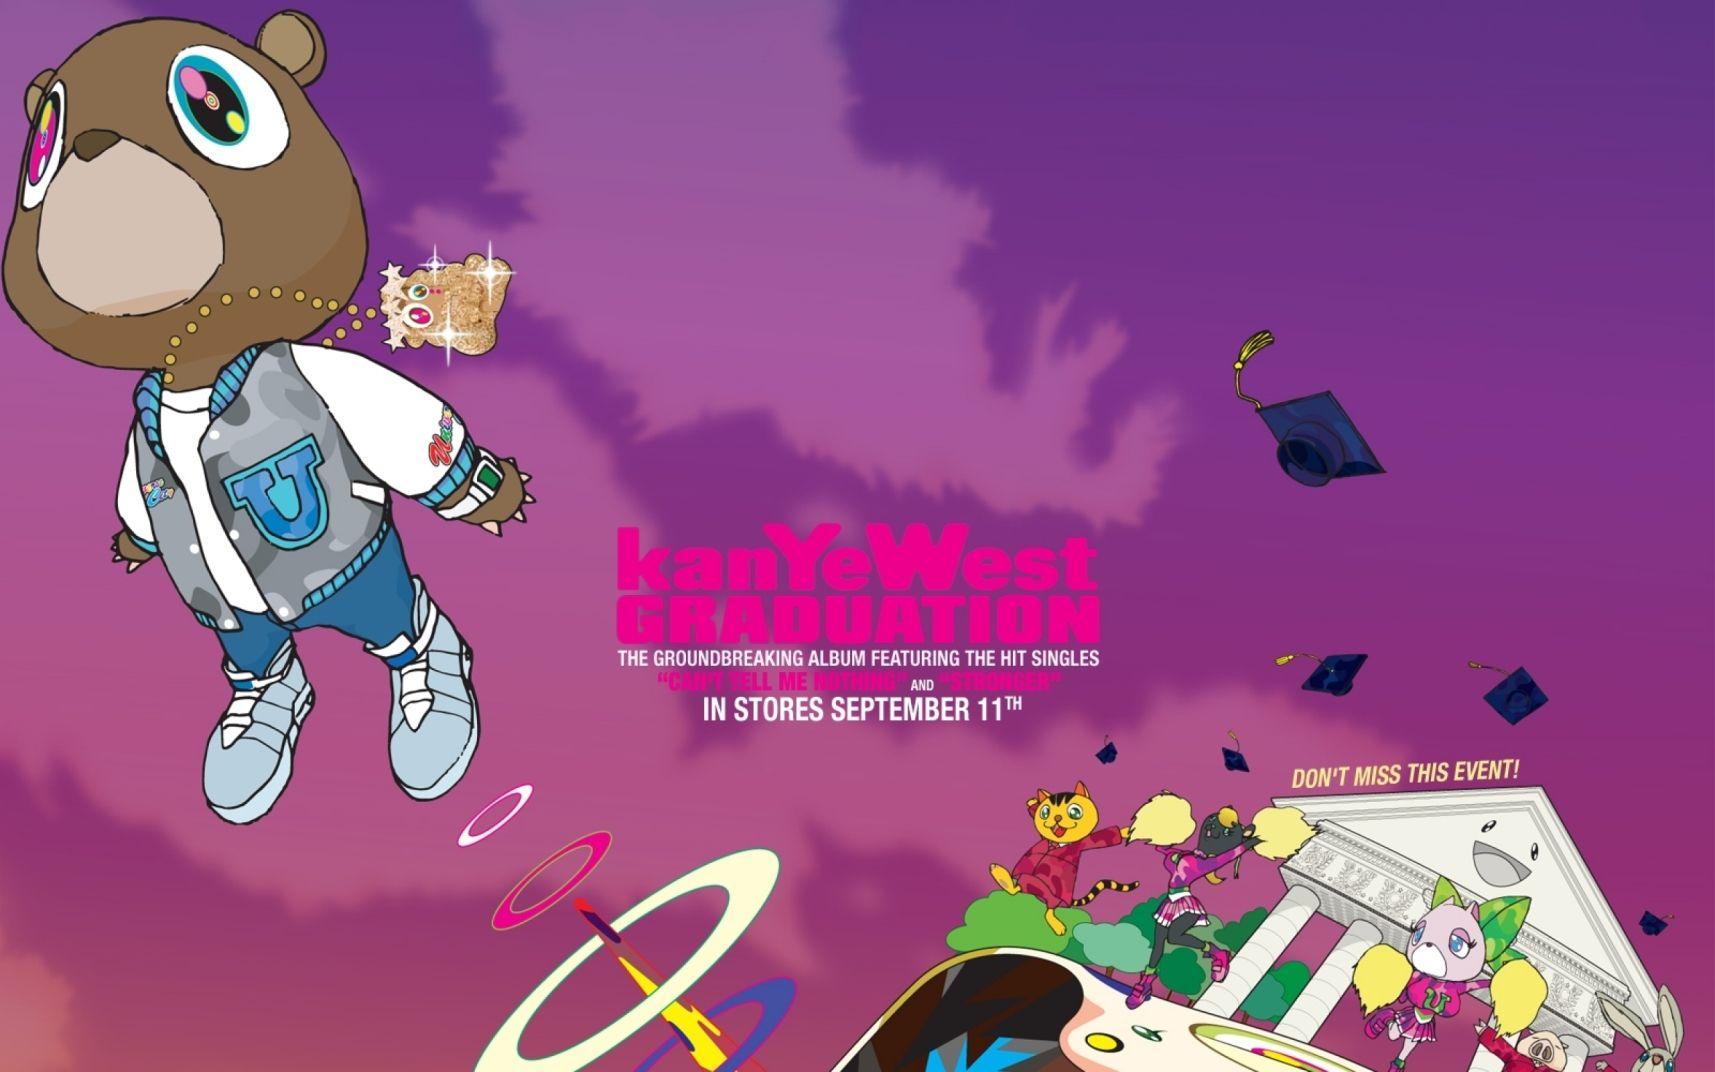 Kanye West Runaway Wallpaper Photo